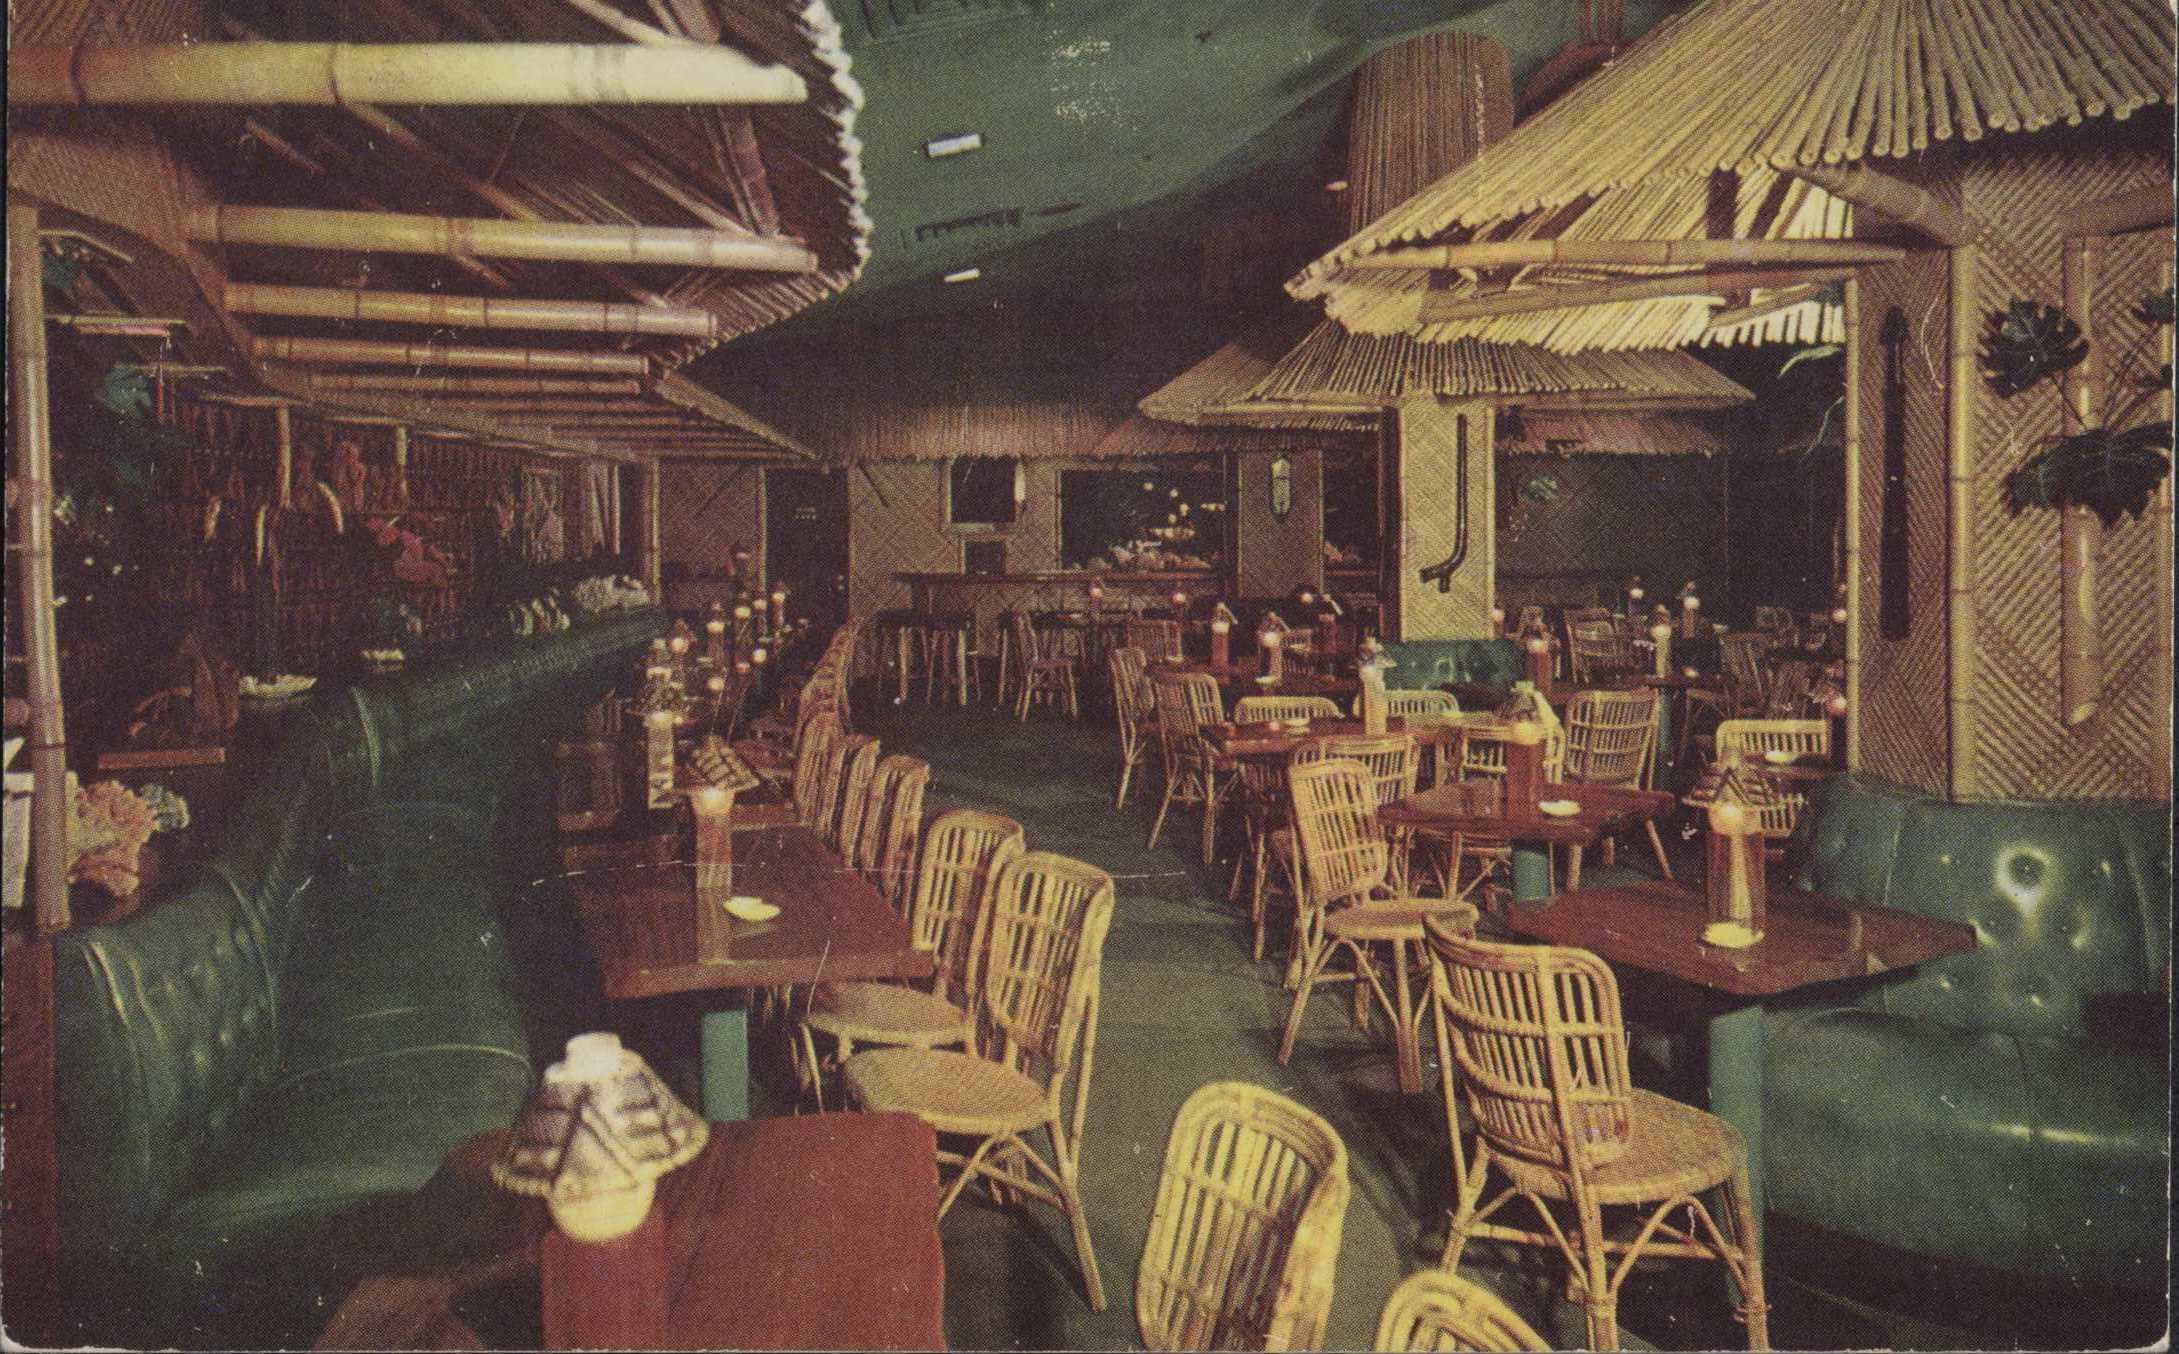 Hotel nicollet waikiki room 1954 postcard side 1 hclib